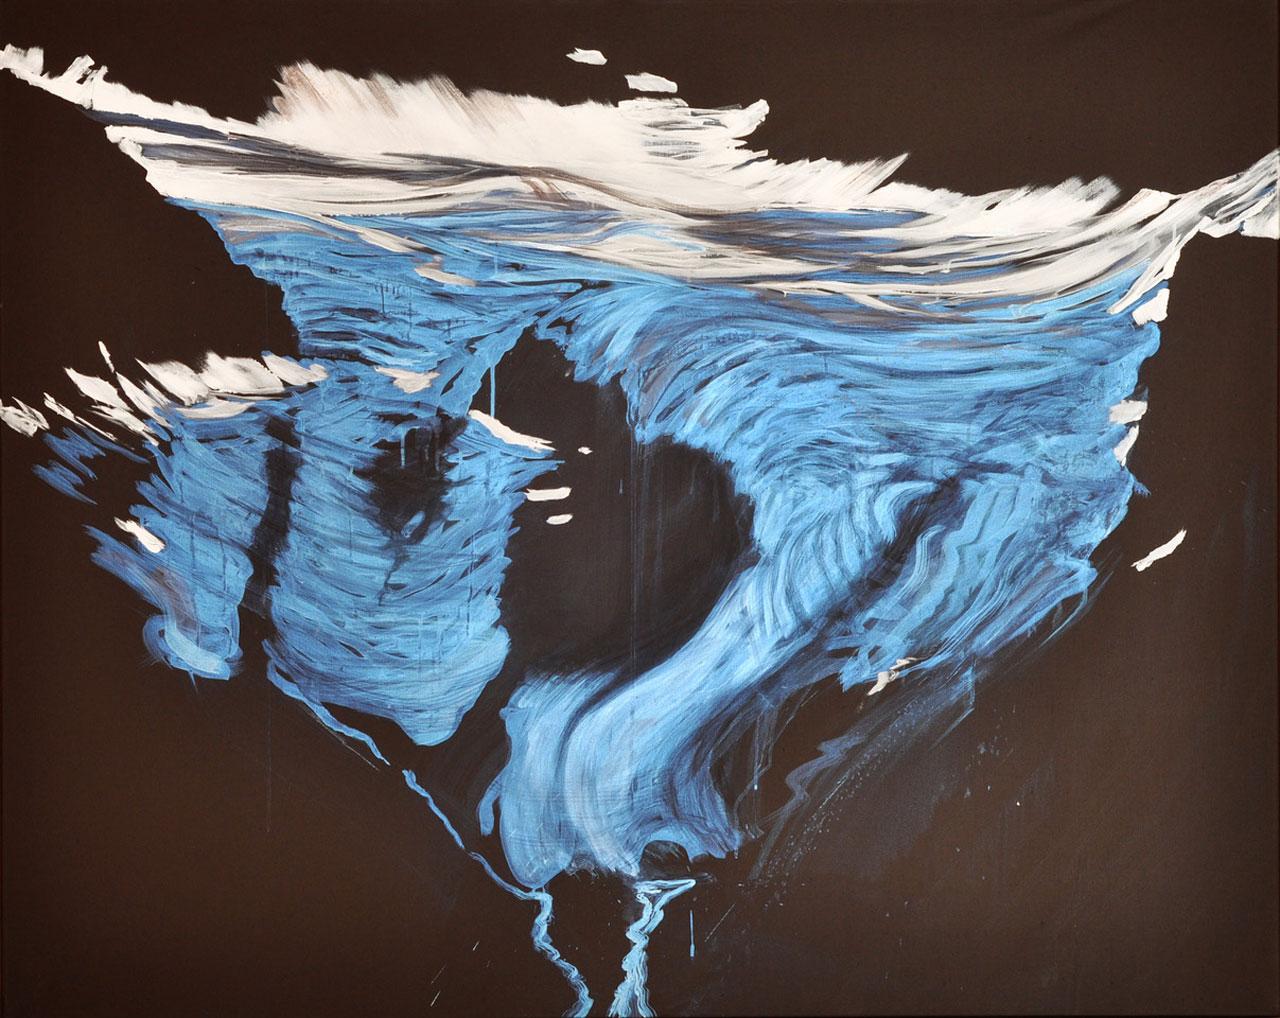 Ochsentalere Gletscher (irisierend) 2012, Acryl/LW, 120 x 150 cm